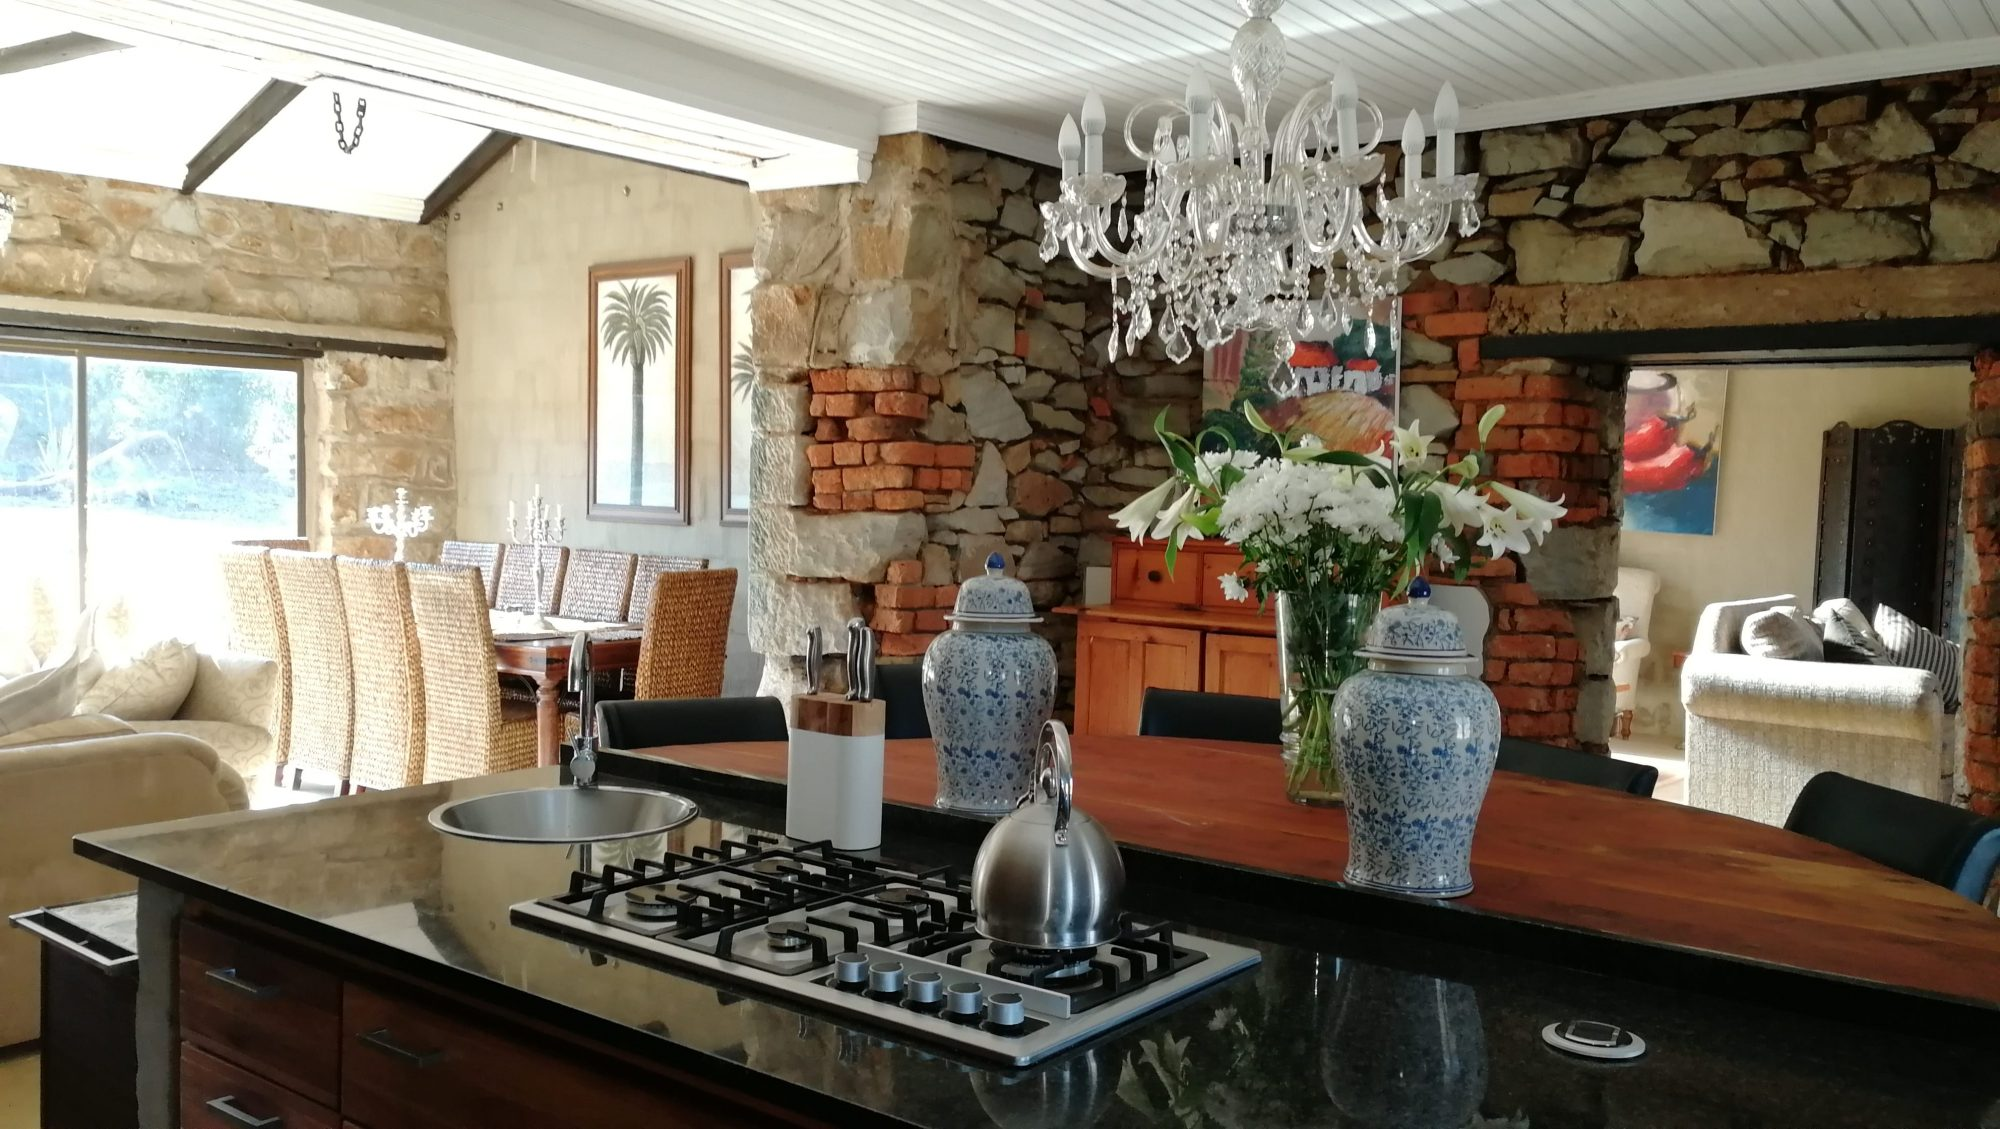 Flitwick Ranch, Southern Drakensberg, KwaZulu-Natal